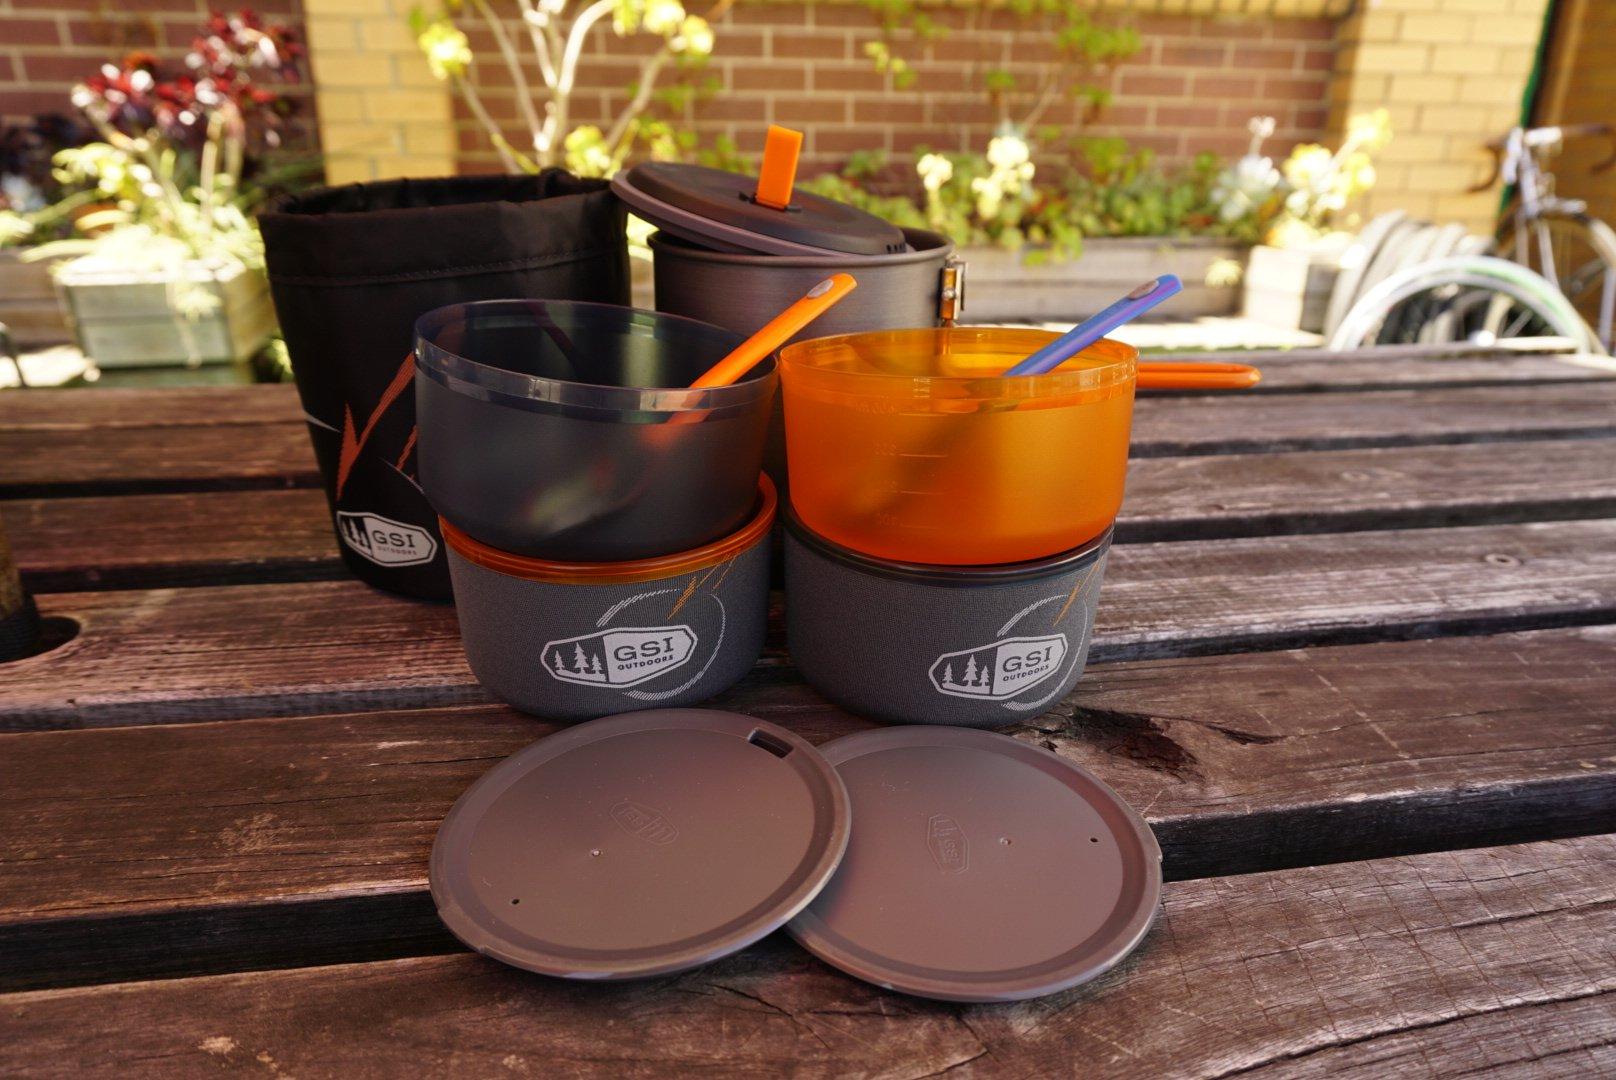 GSI Microdualist cookset unpacked